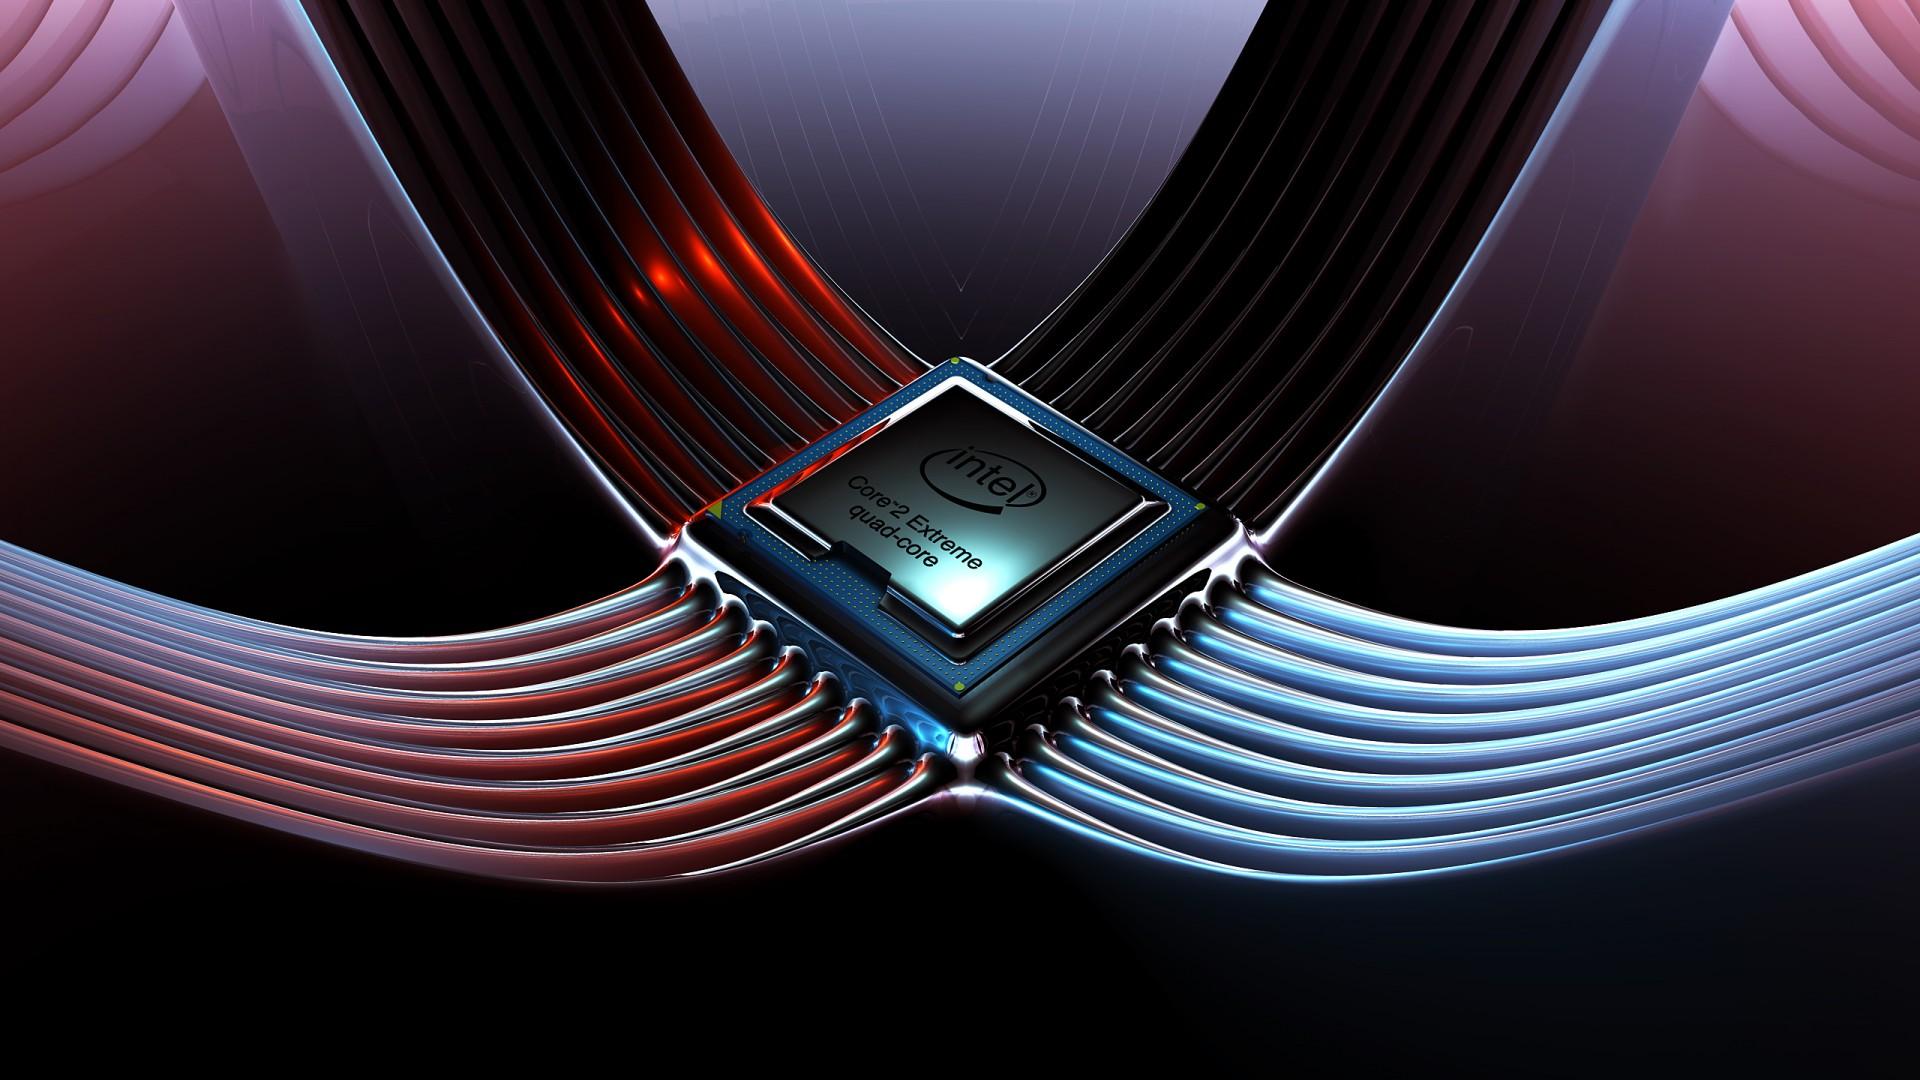 NobleWalls Intel core 2 quad desktop and mobile background 1920x1080